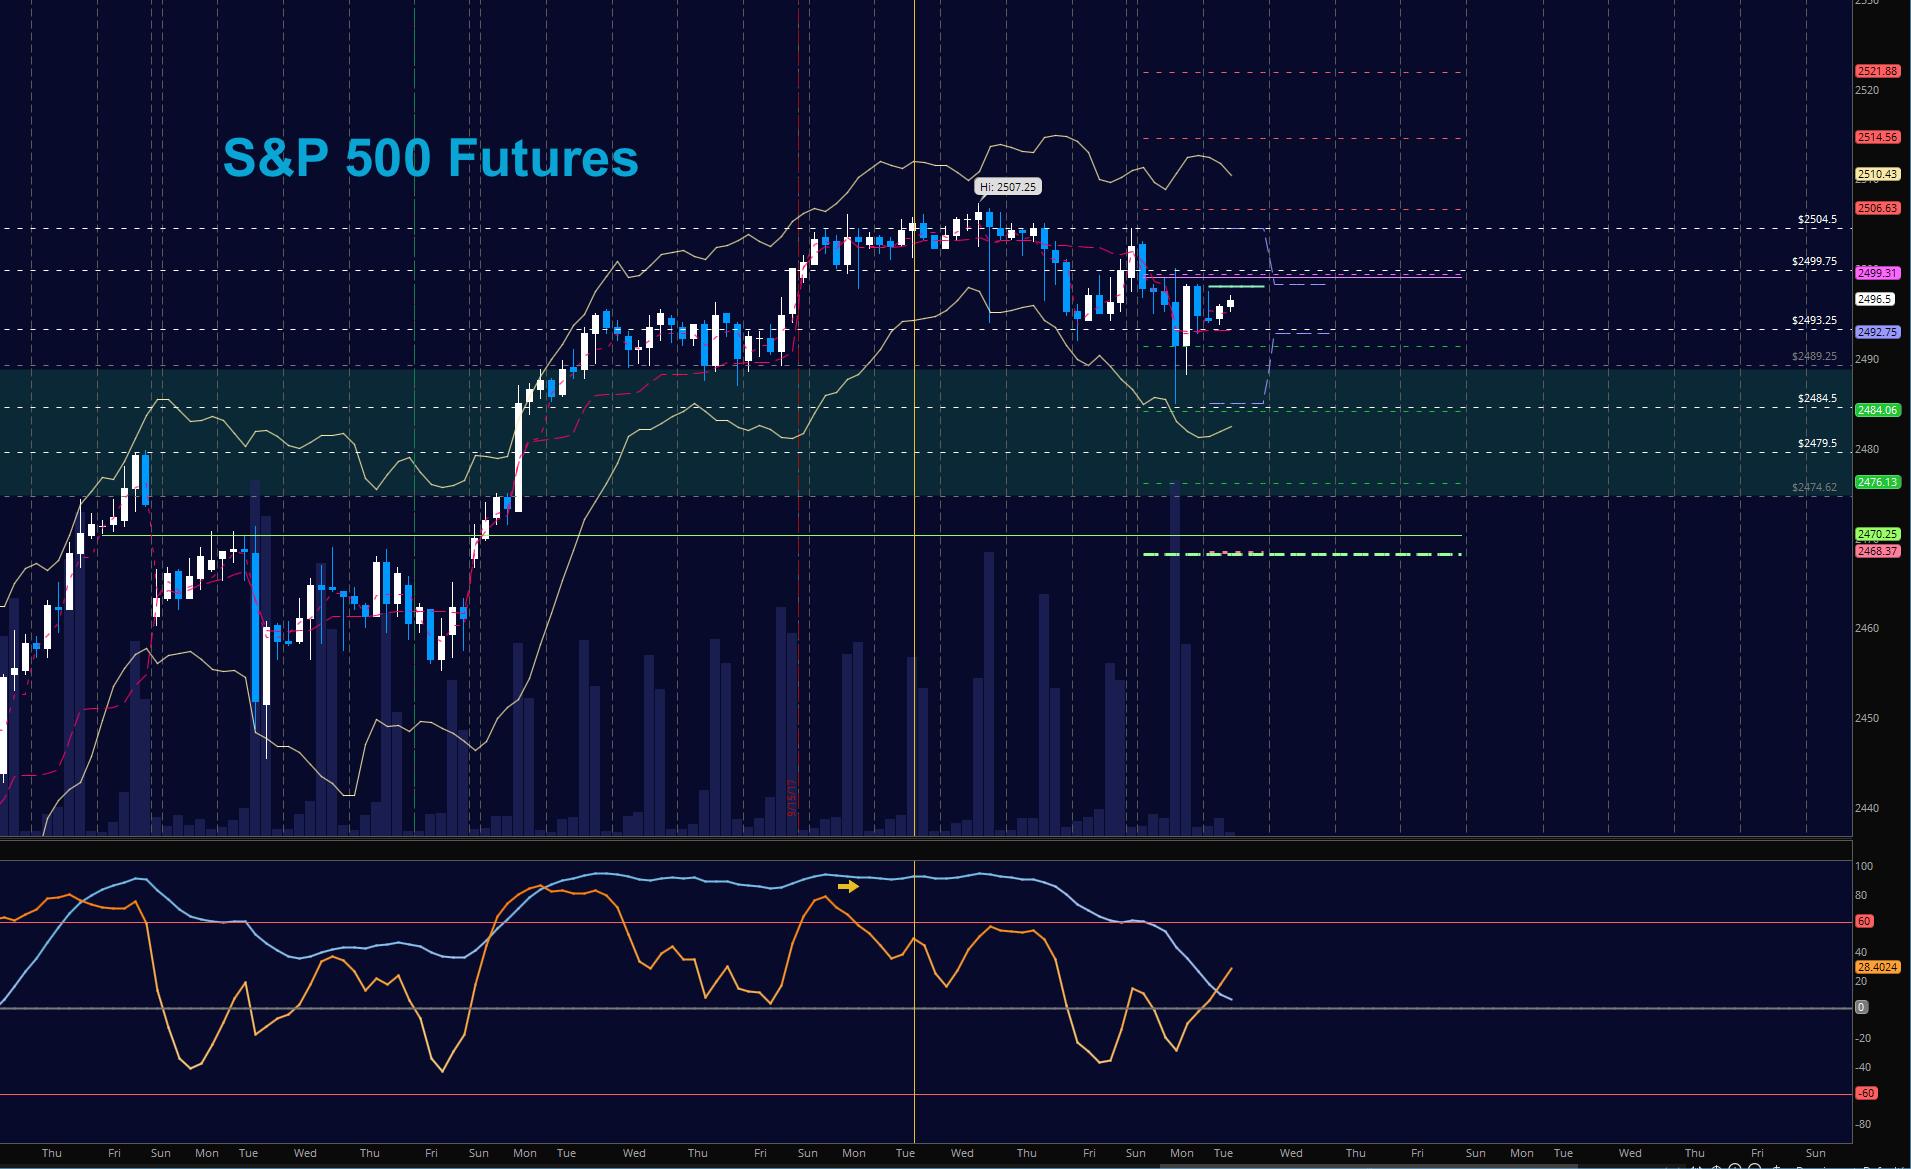 s&p 500 futures es trading fibonacci price support resistance september 26